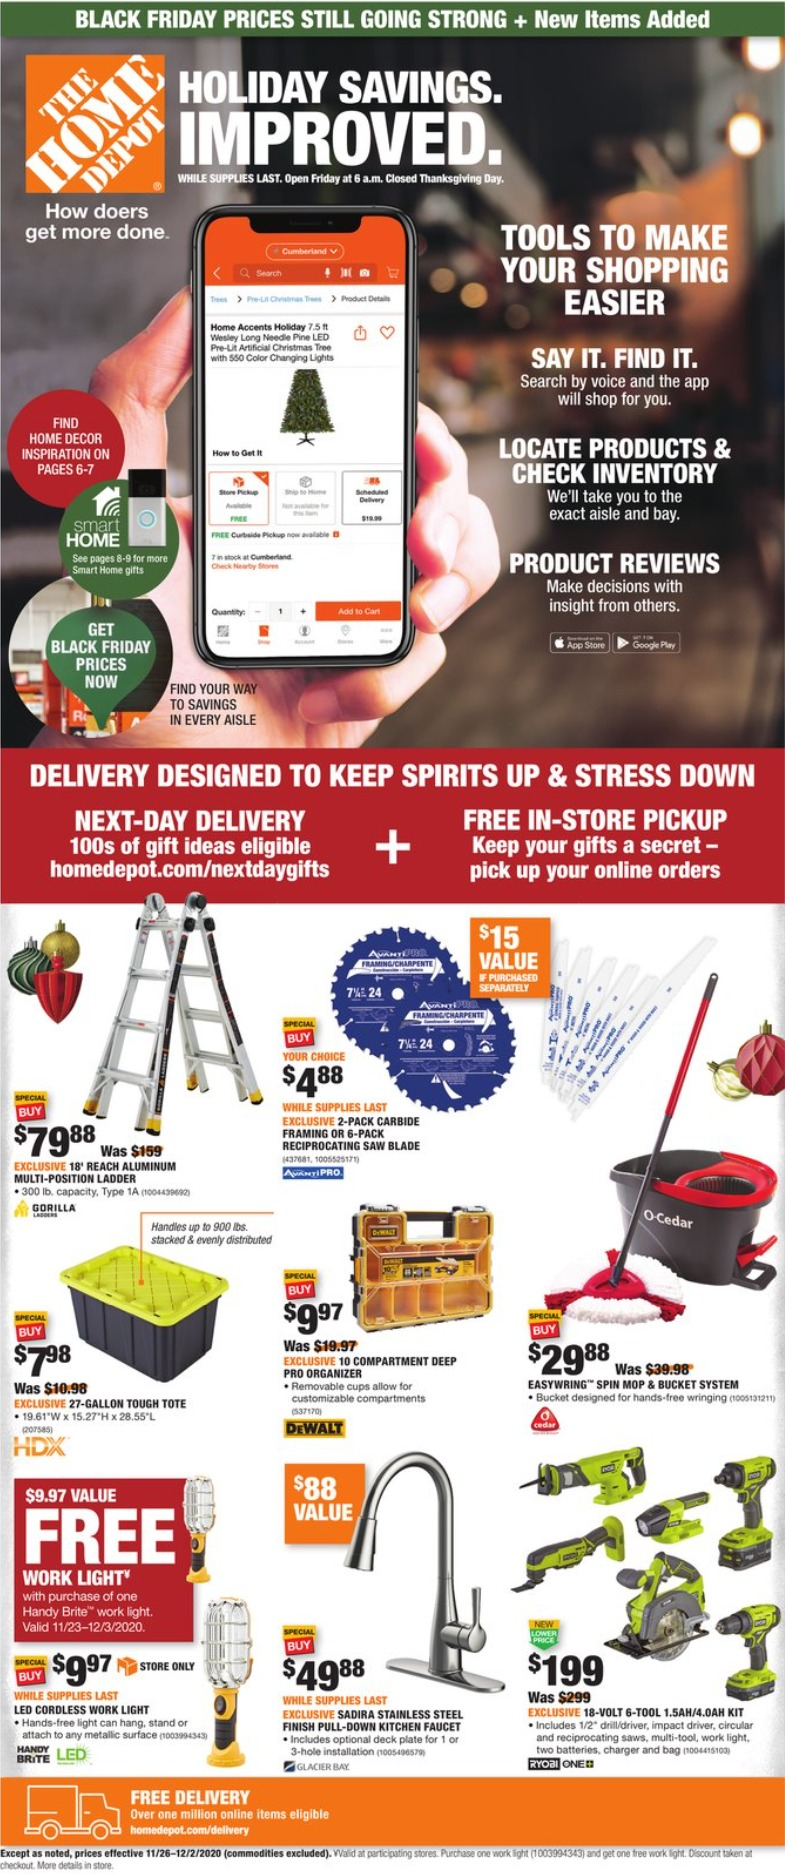 Home Depot Black Friday Deals 2020